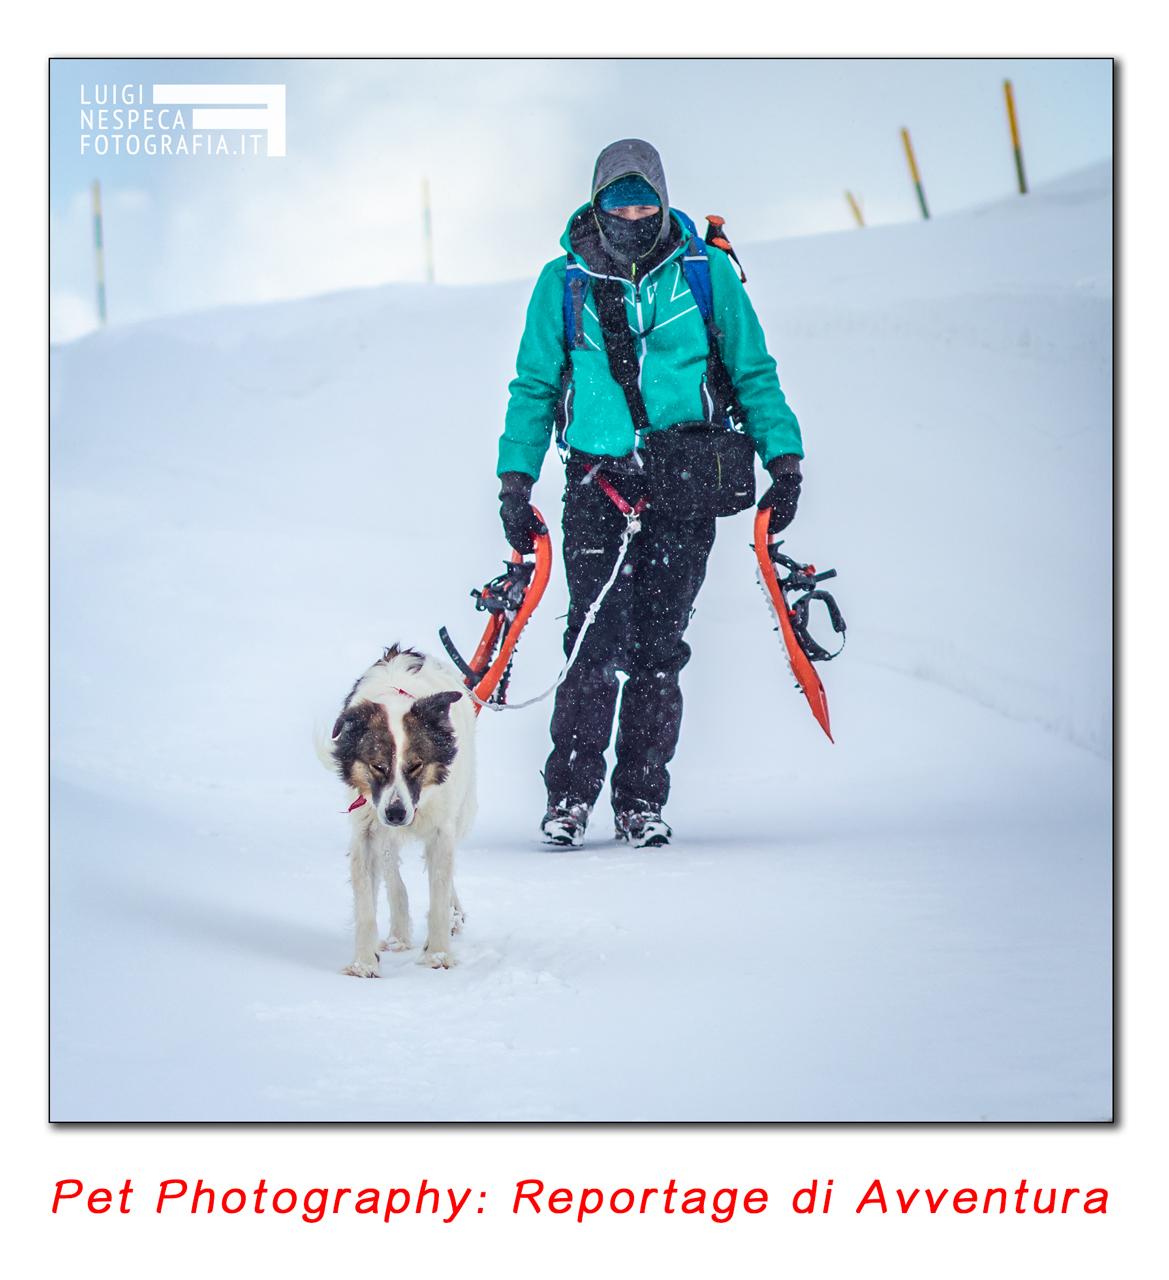 Pet Photography: reportage di avventura